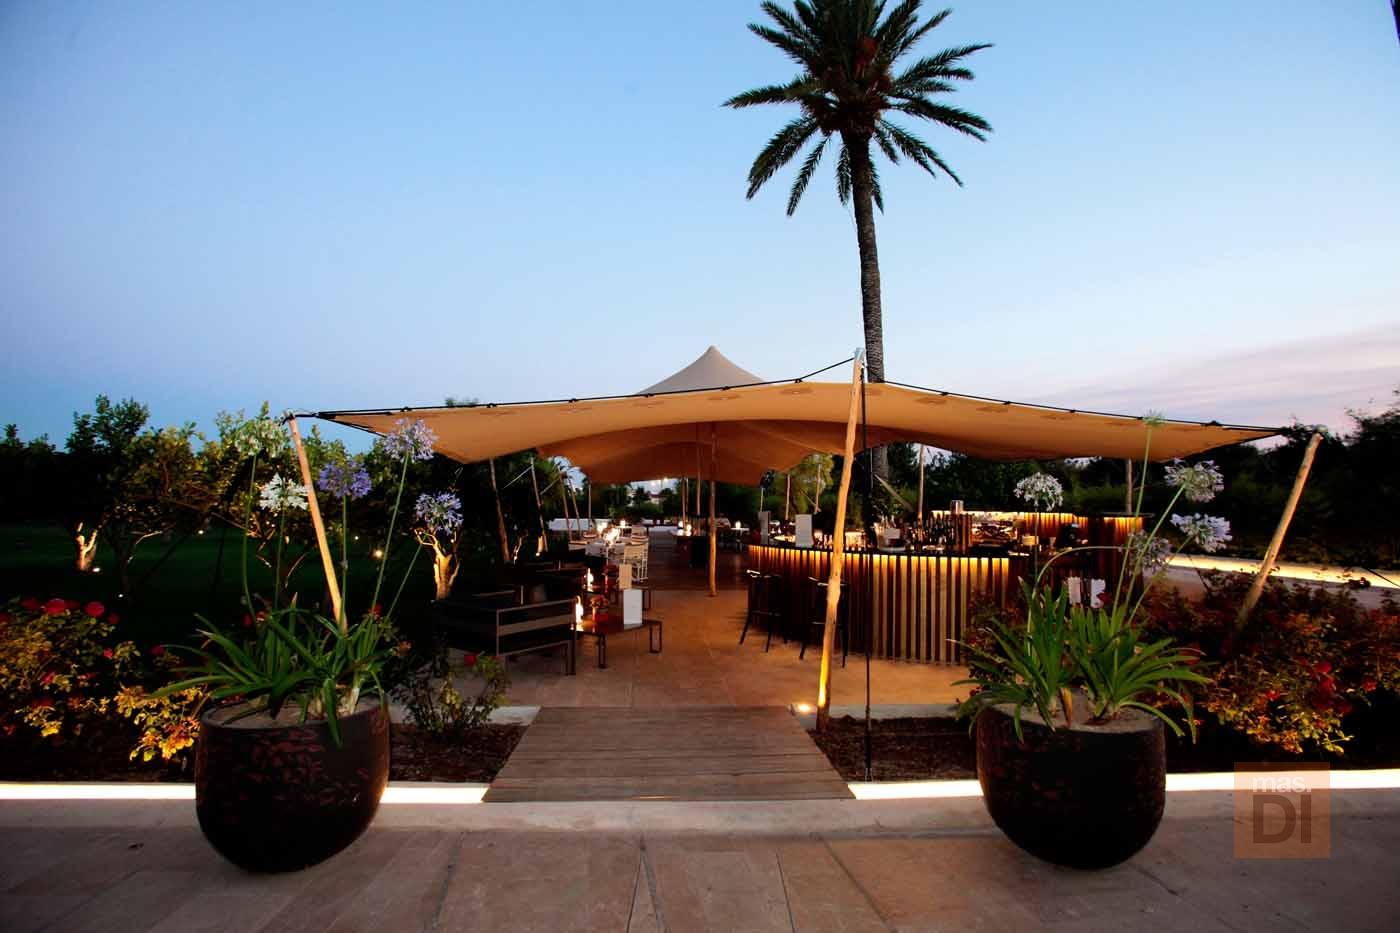 Hotel Xereca. Calidad total en plena naturaleza junto a Ibiza